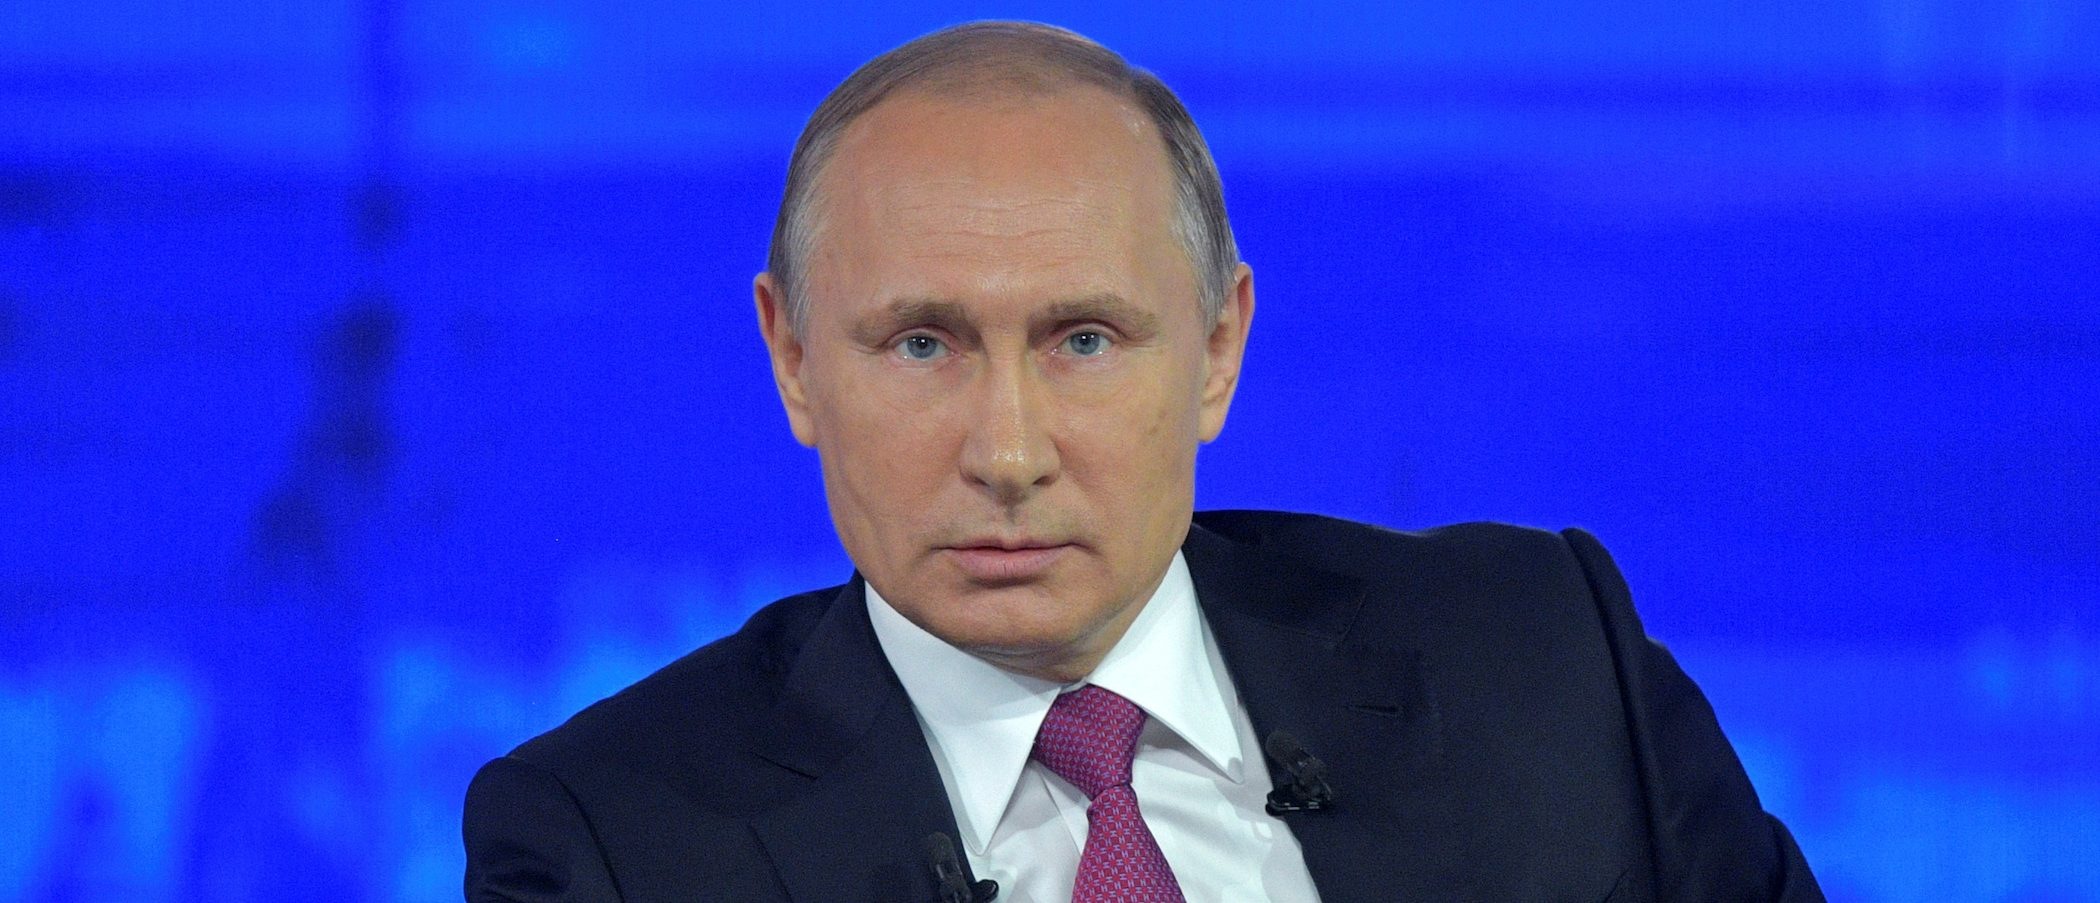 Photo By: Sputnik/Alexei Druzhinin/Kremlin via REUTERS